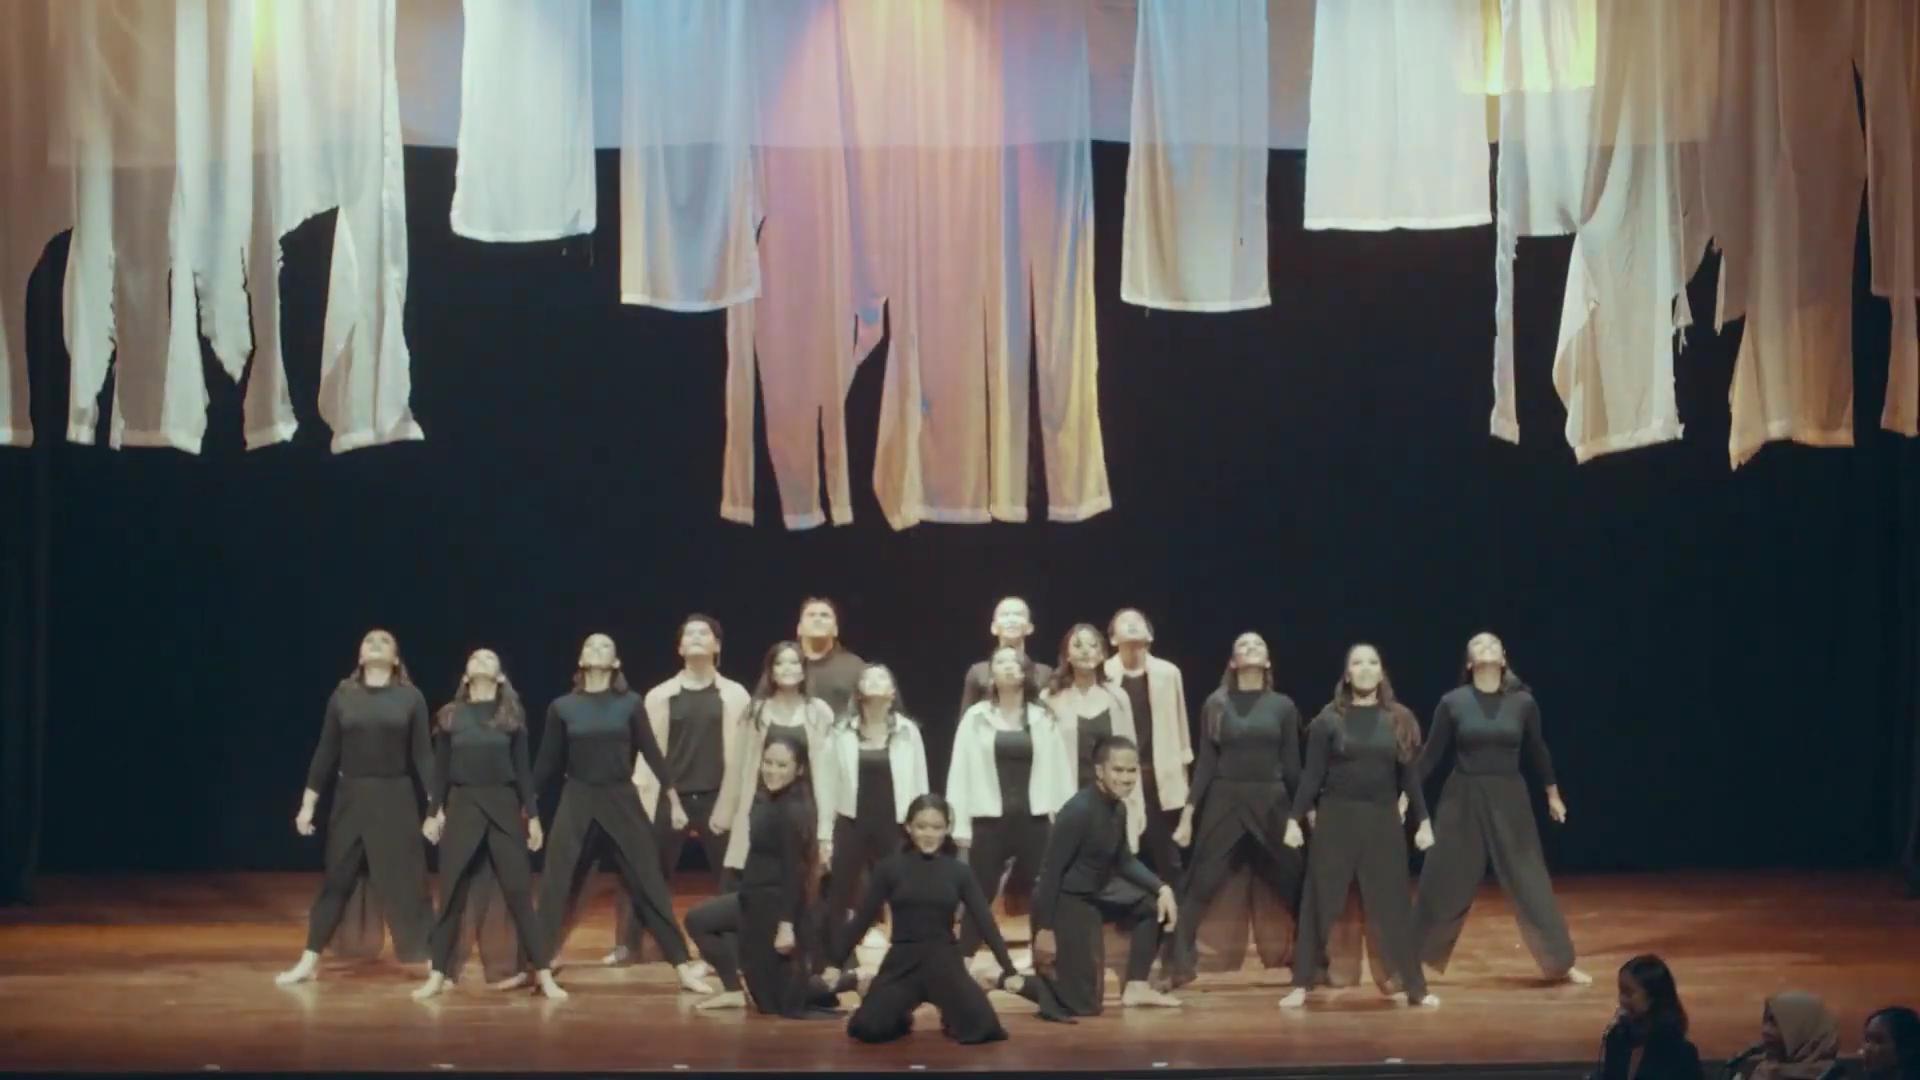 [UPDATE] Senandika Musical Theatre #CeritaKita